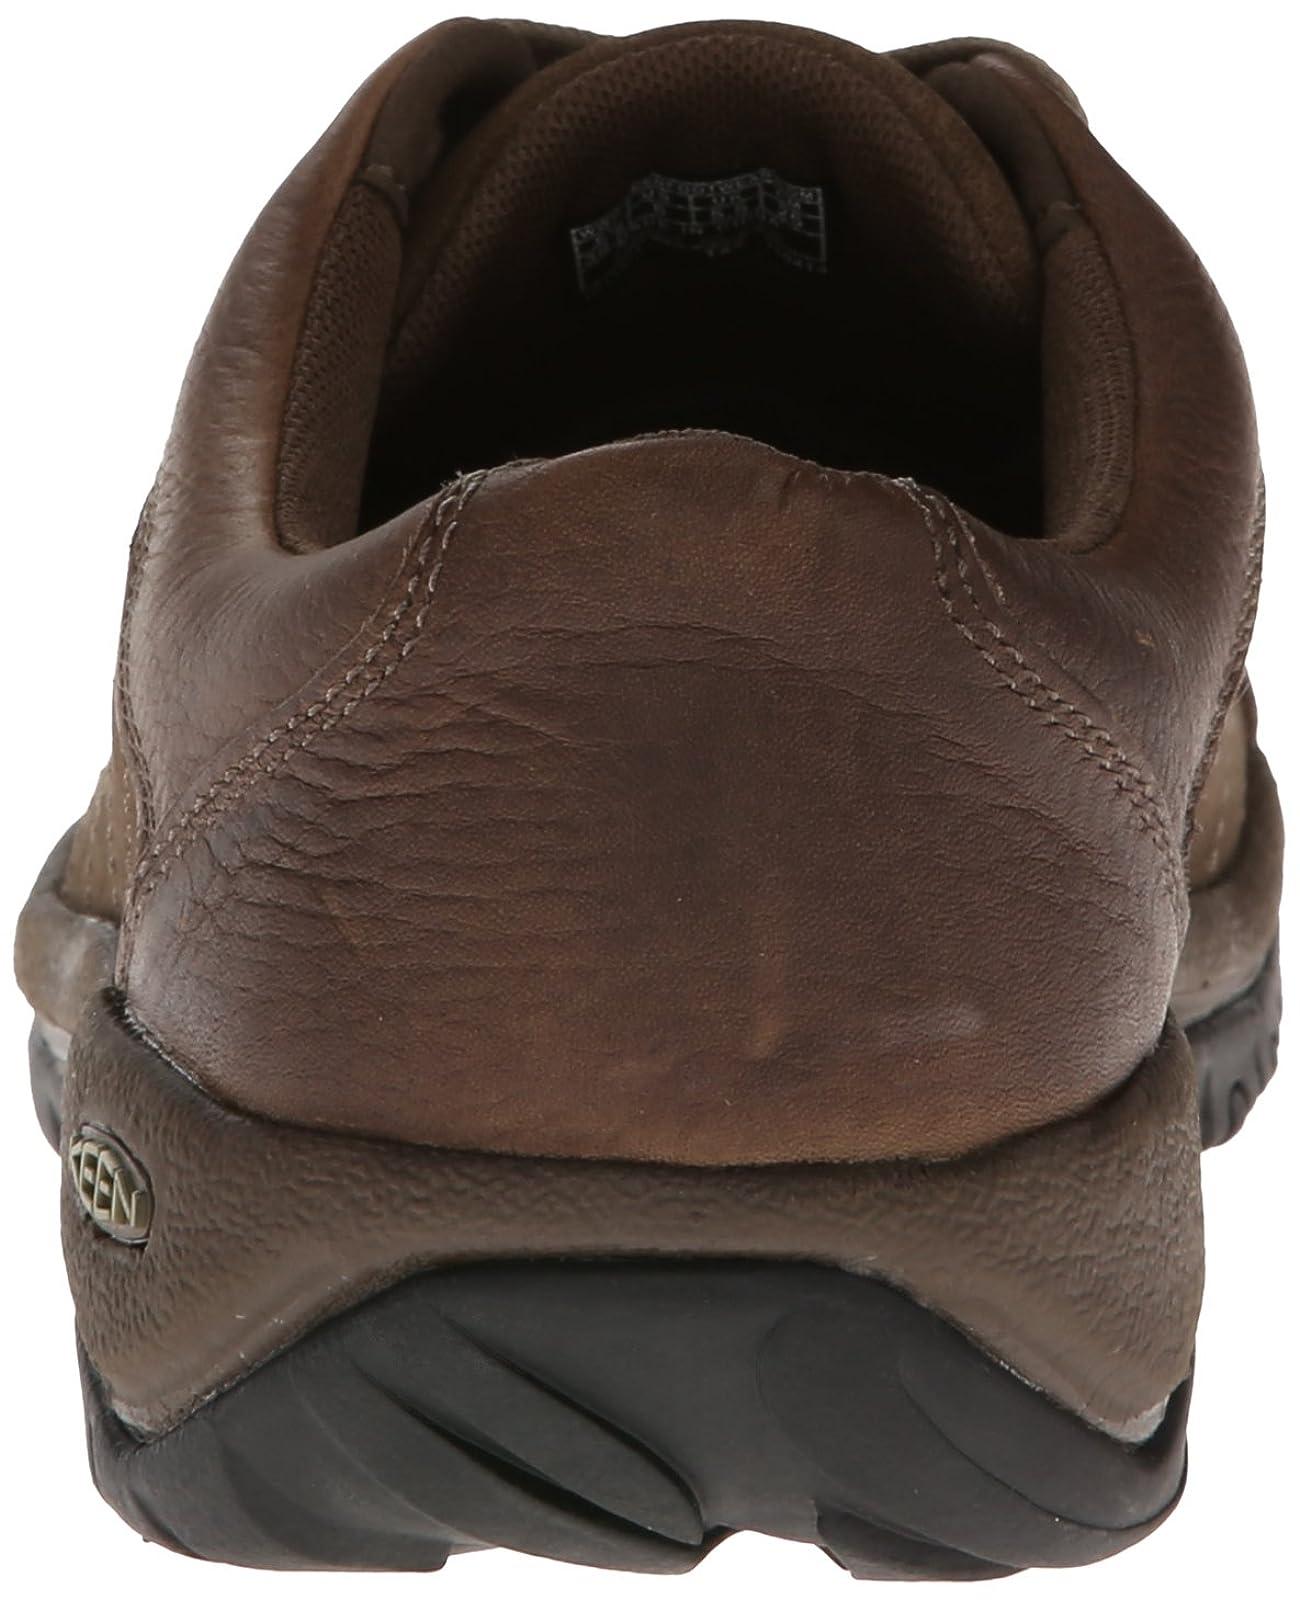 KEEN Women's Presidio Shoe Cascade Brown/Shitake 9.5 M US Women - 2